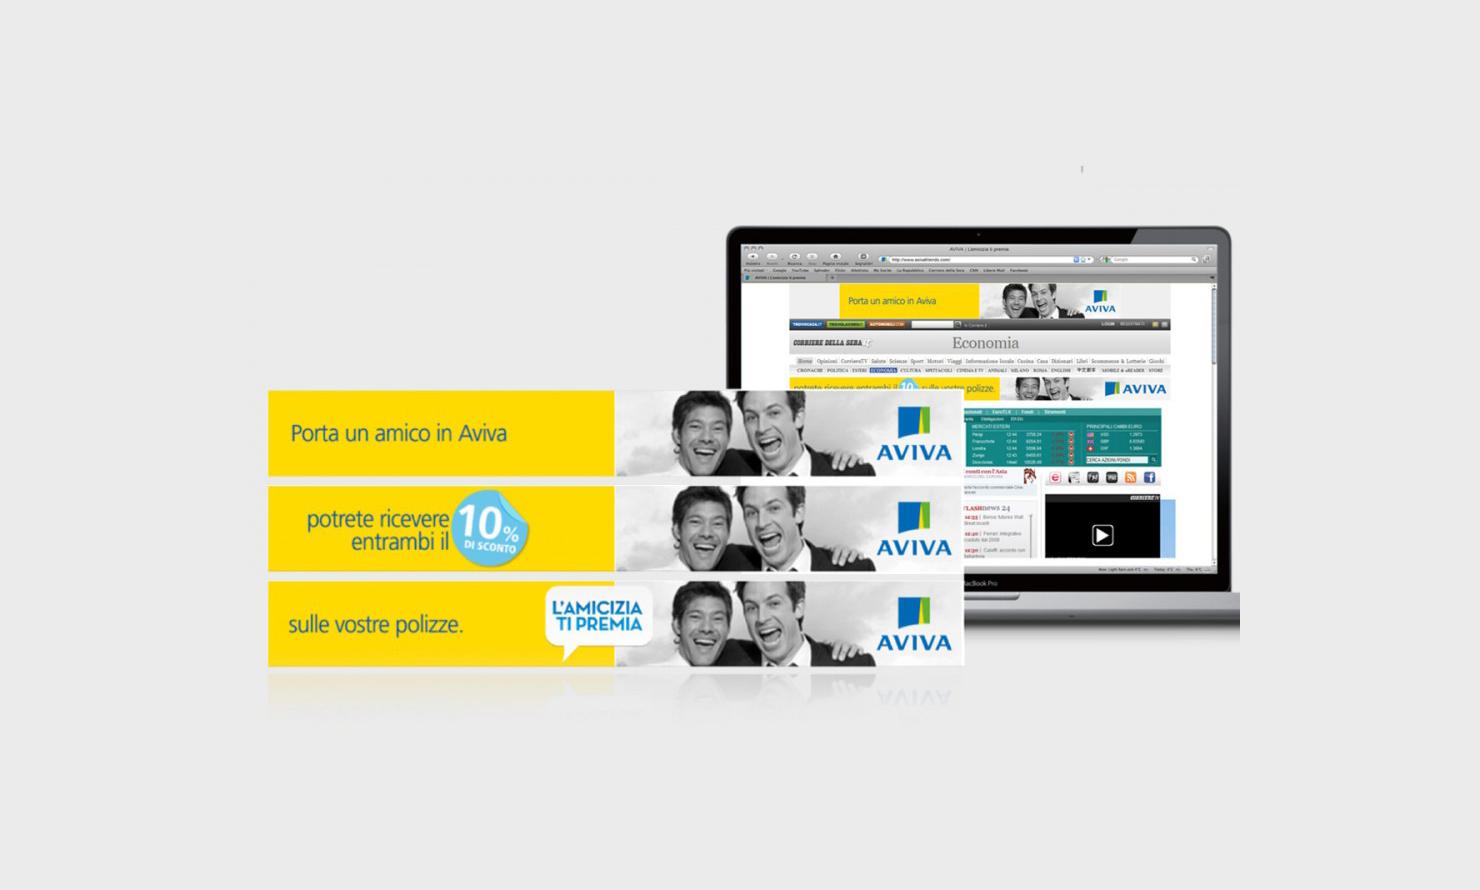 https://kubelibre.com/uploads/Slider-work-tutti-clienti/aviva-l-amicizia-ti-premia-member-get-member-3.jpg